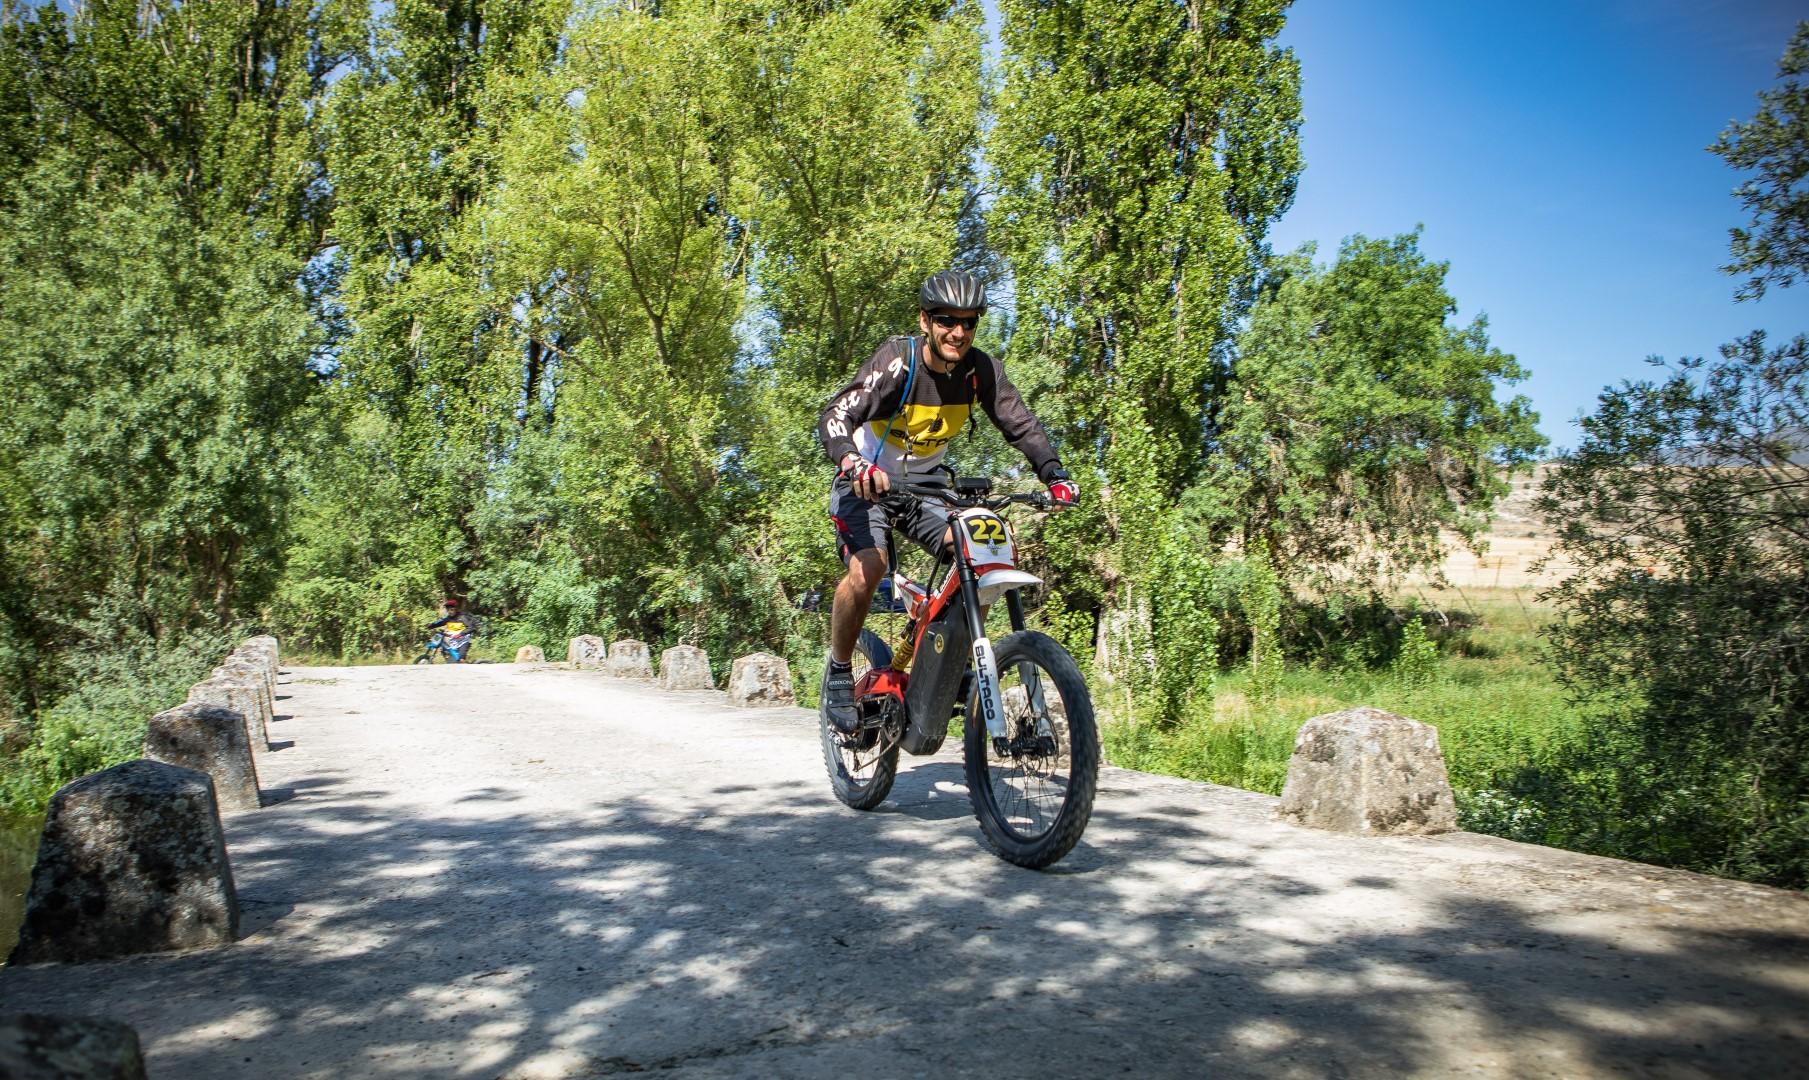 Bultaco Brinco Endurance, fotos